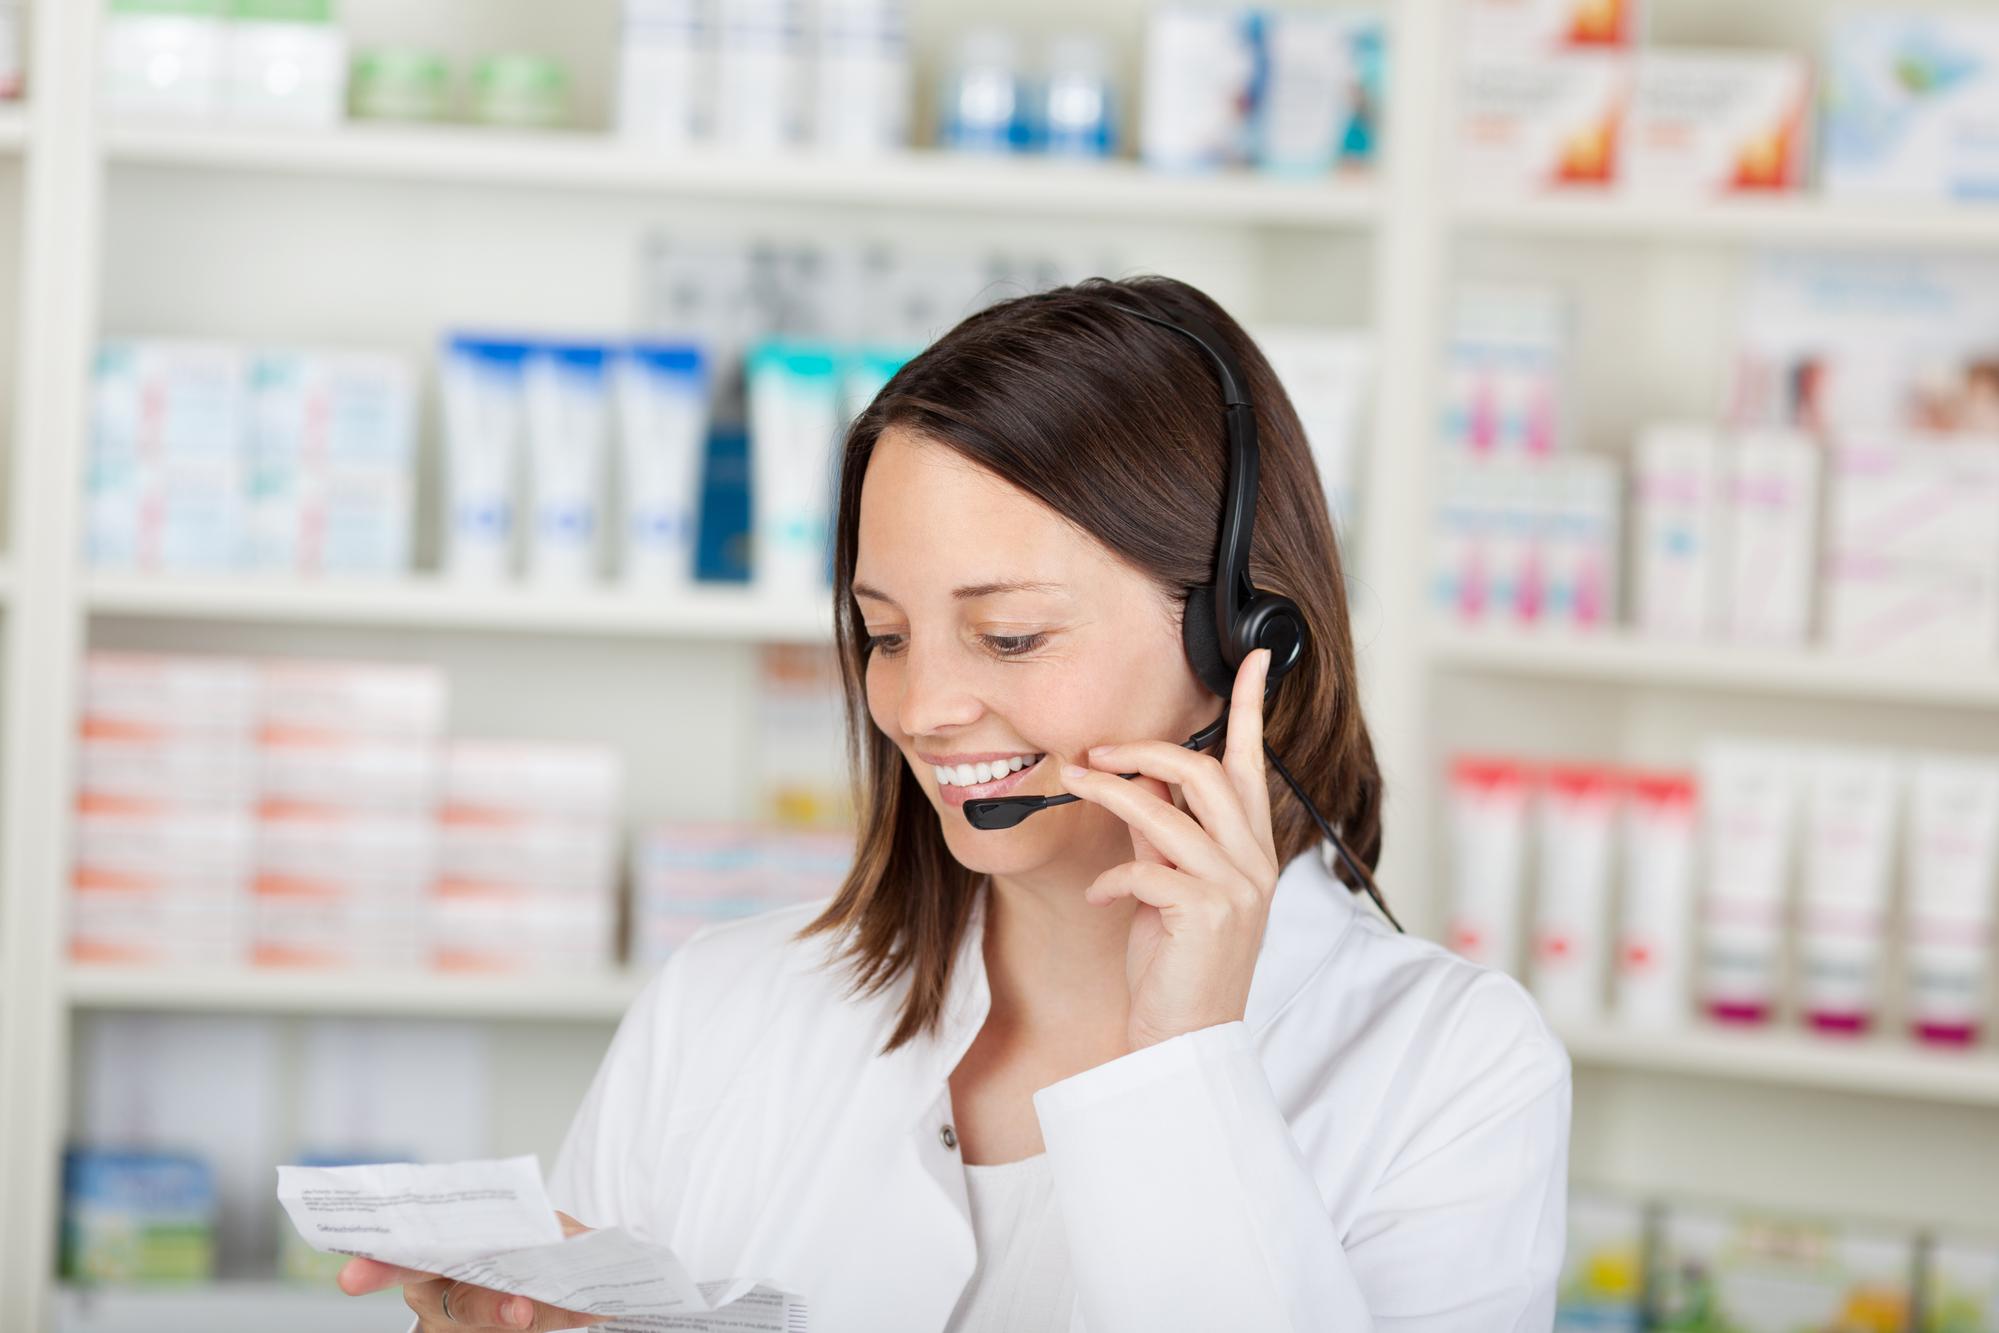 Happy mid adult female pharmacist conversing on headset in pharmacy